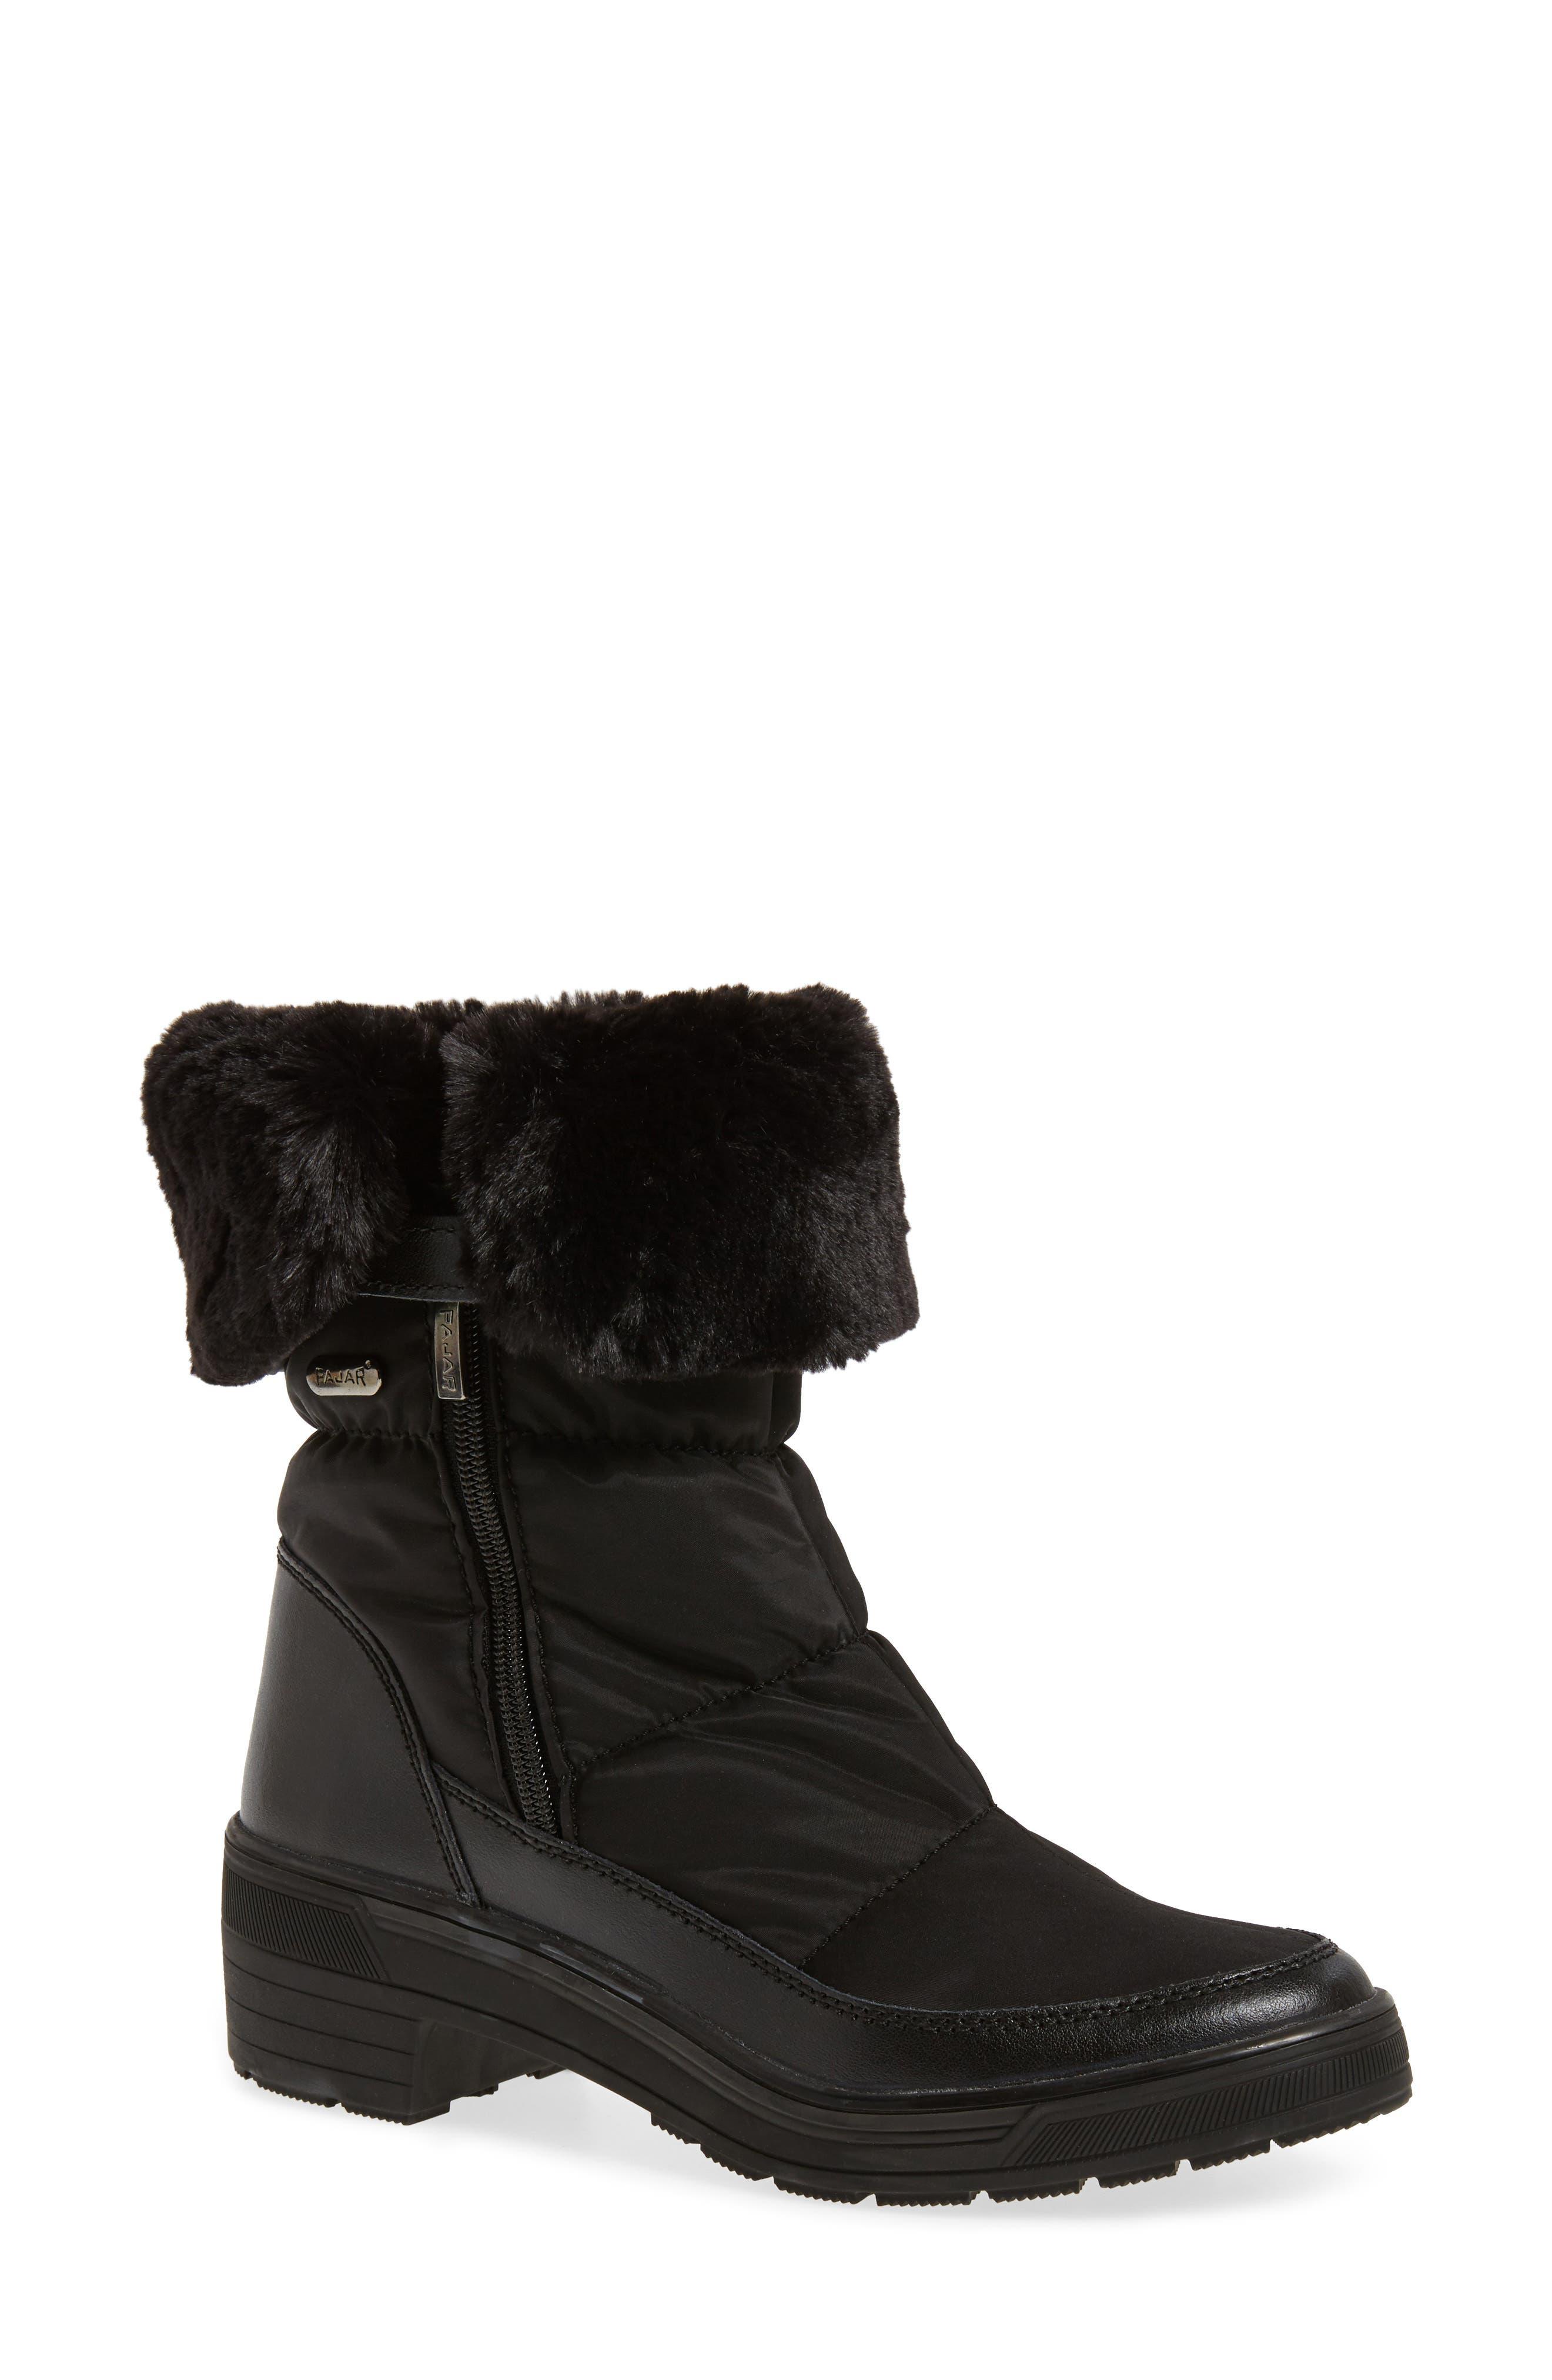 Ventura Weatherproof Faux Fur Lined Boot,                         Main,                         color, 001